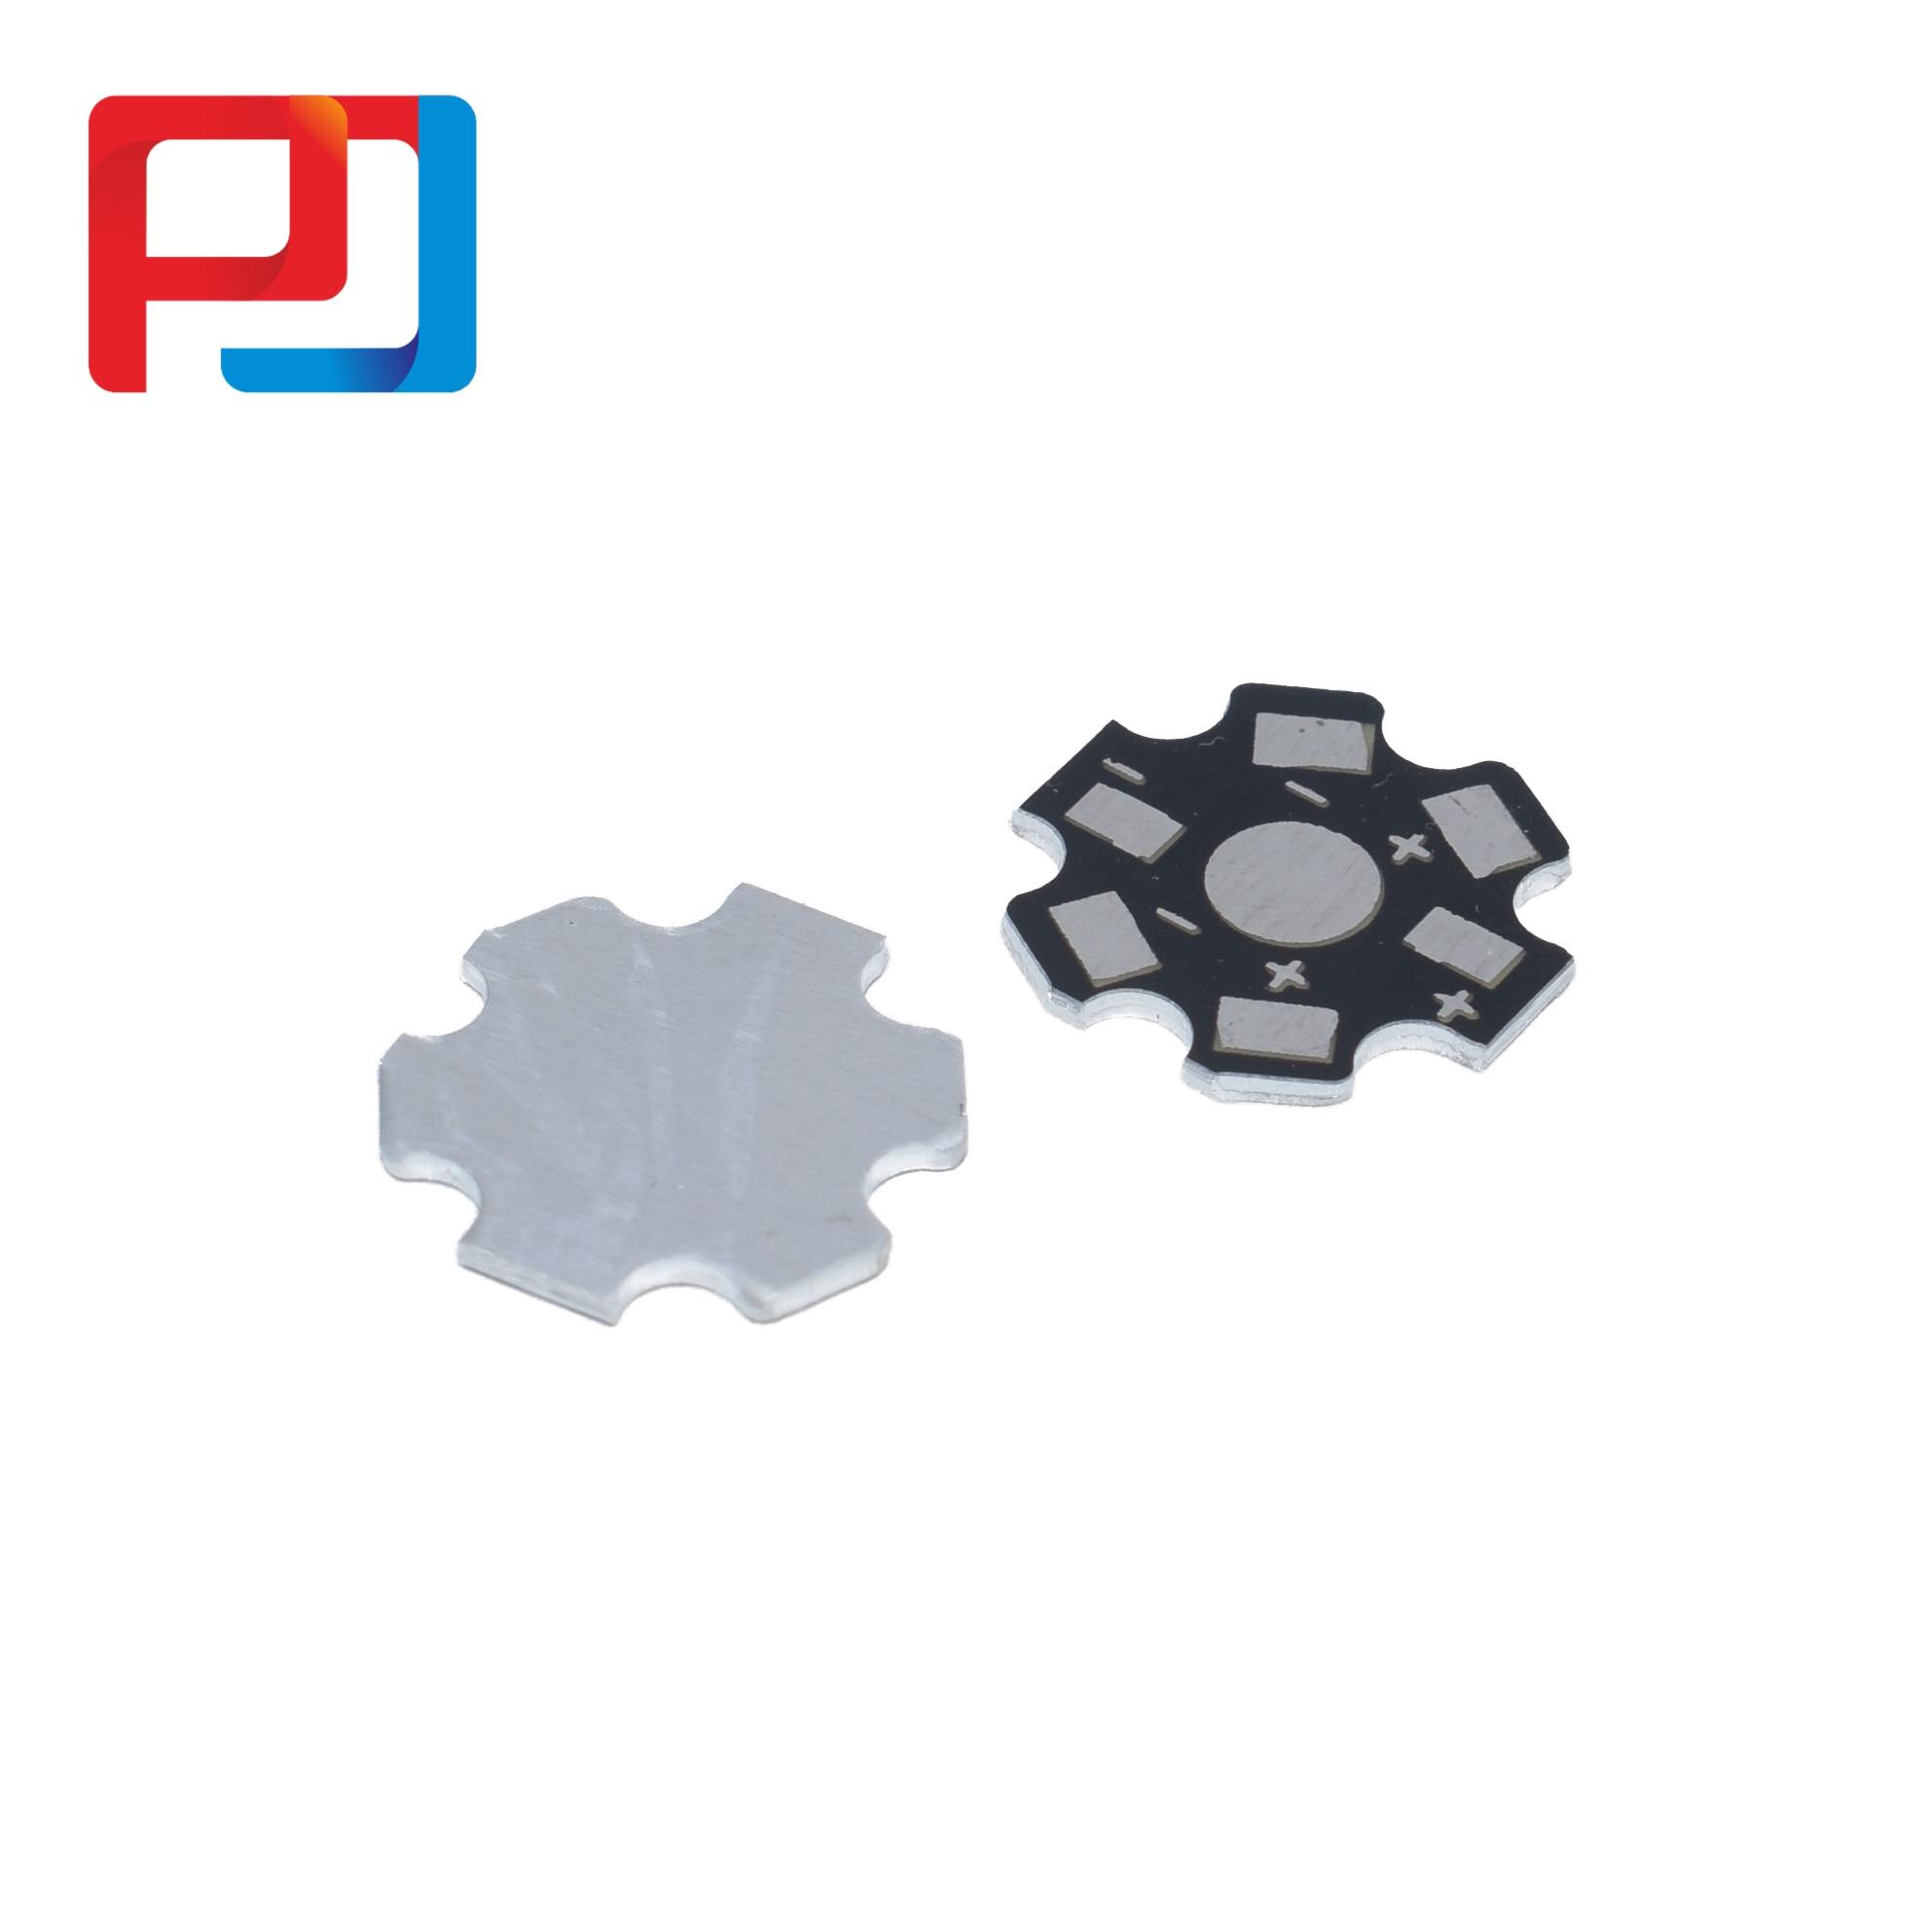 50Pcs//Pack High Power LED Radiator Base Plate Radiator For PCB Board Metal